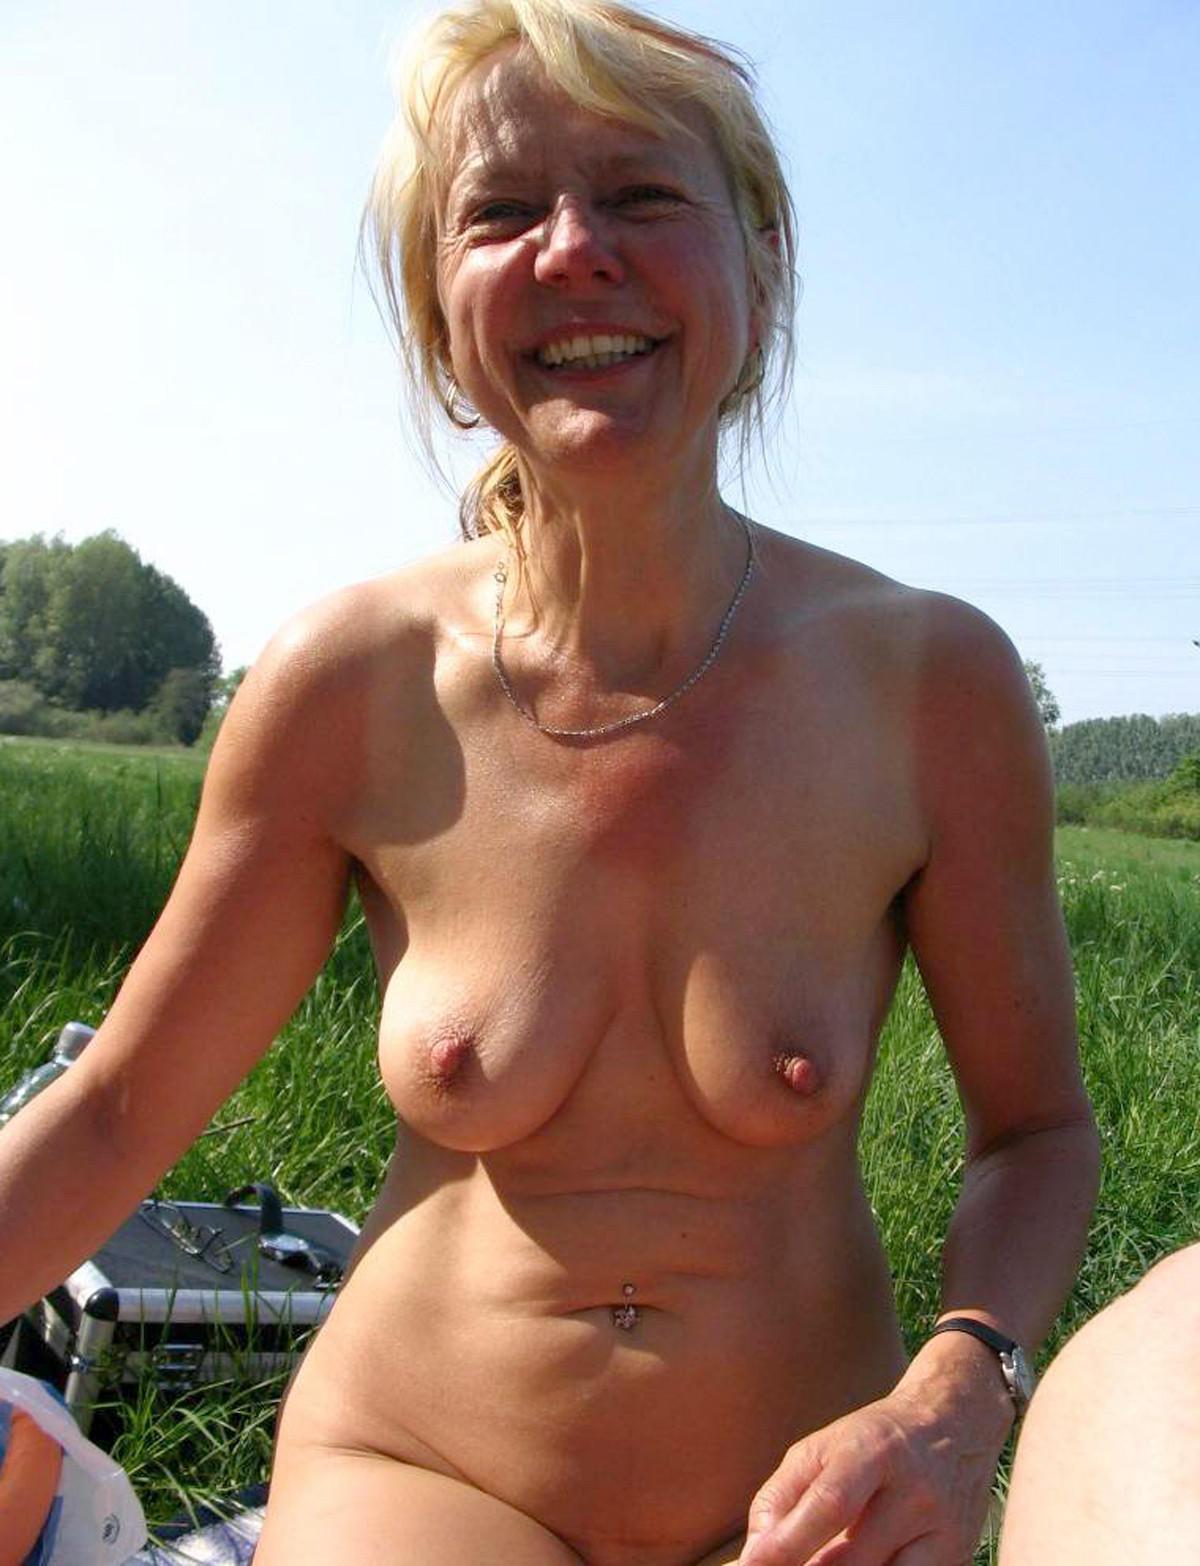 Kyla a kinky granny has wonderful formed beautyful tits